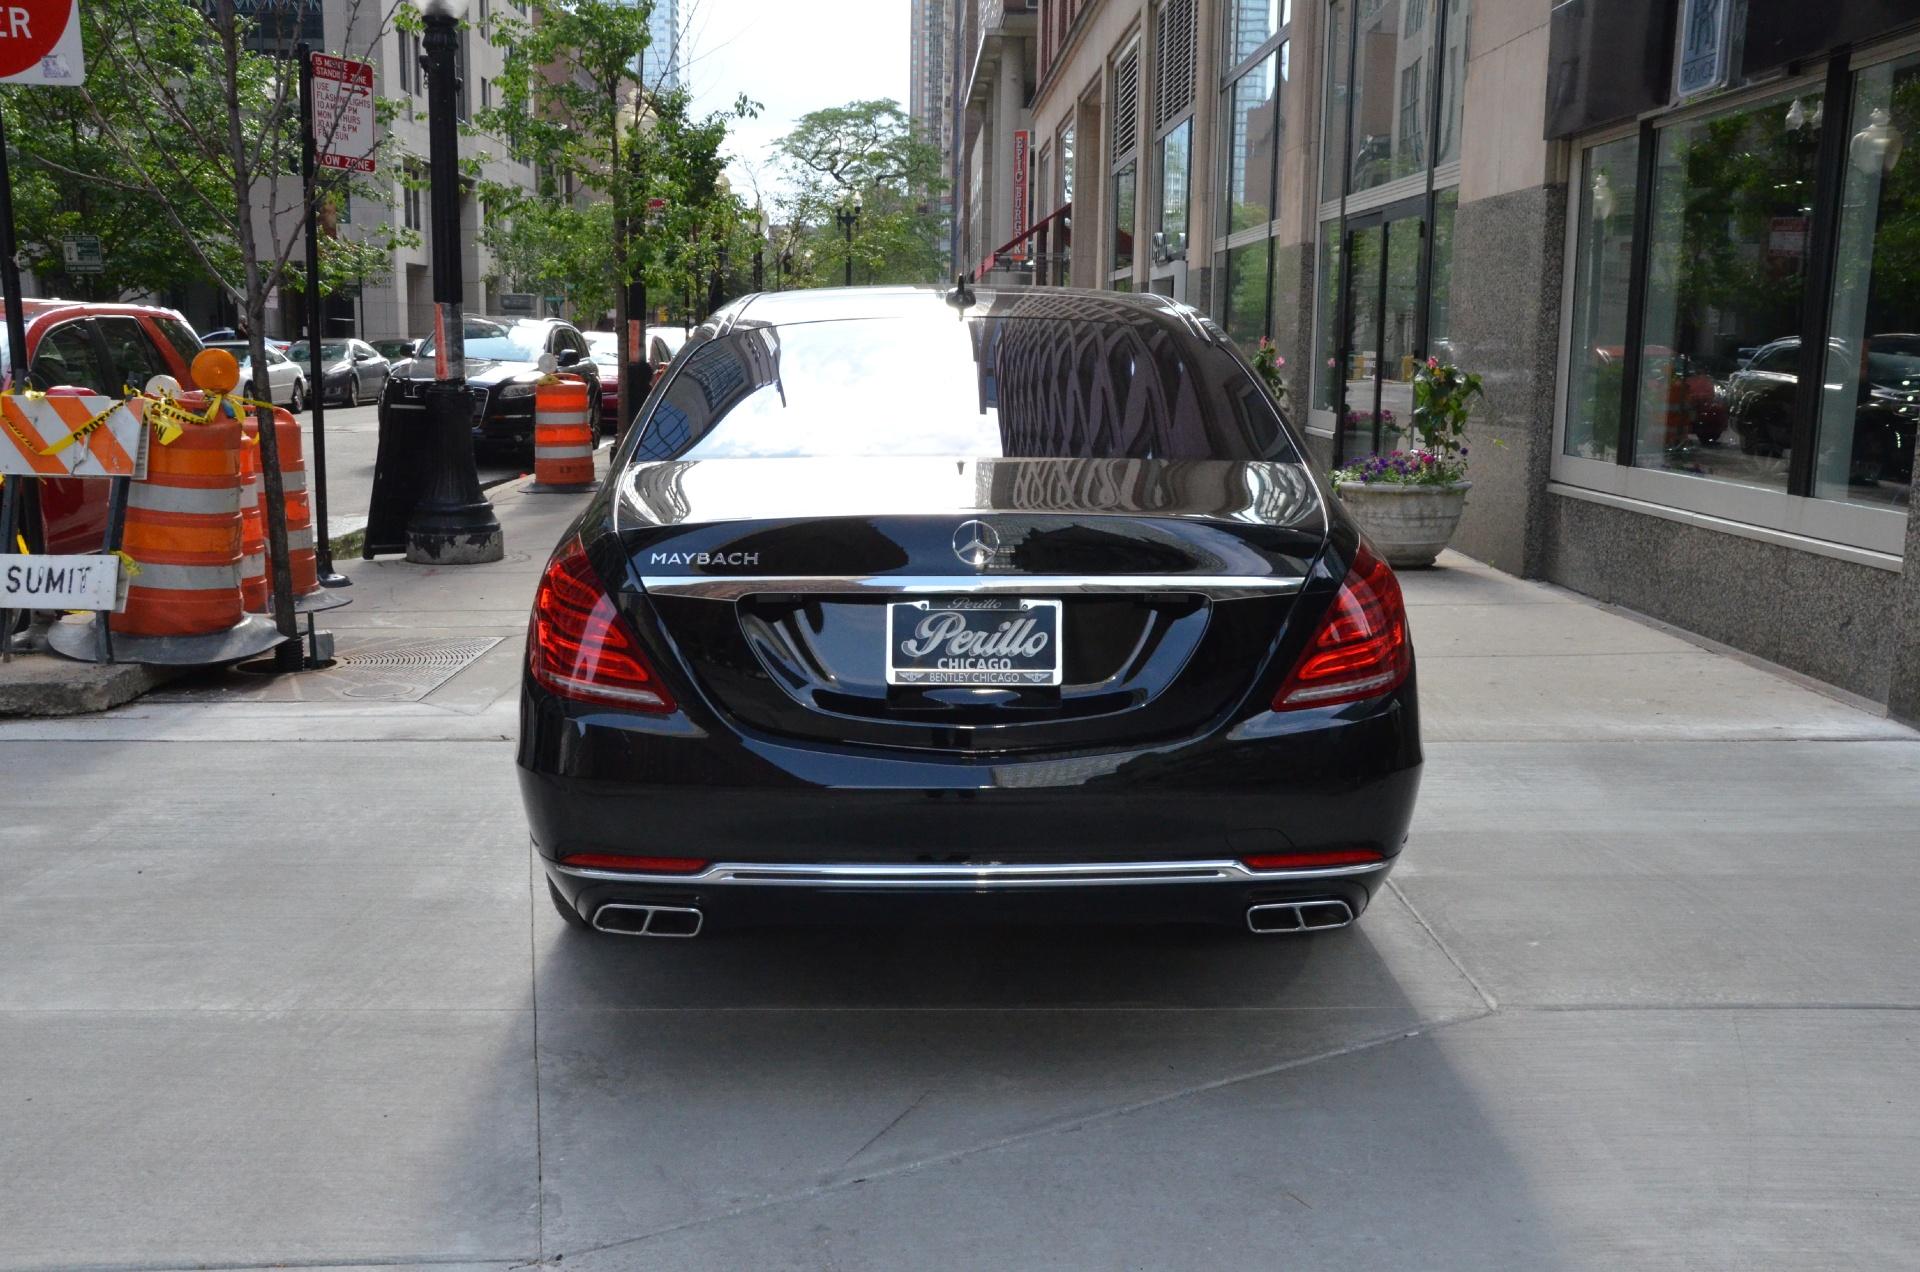 2016 mercedes benz s class mercedes maybach s600 stock for Mercedes benz dealer chicago